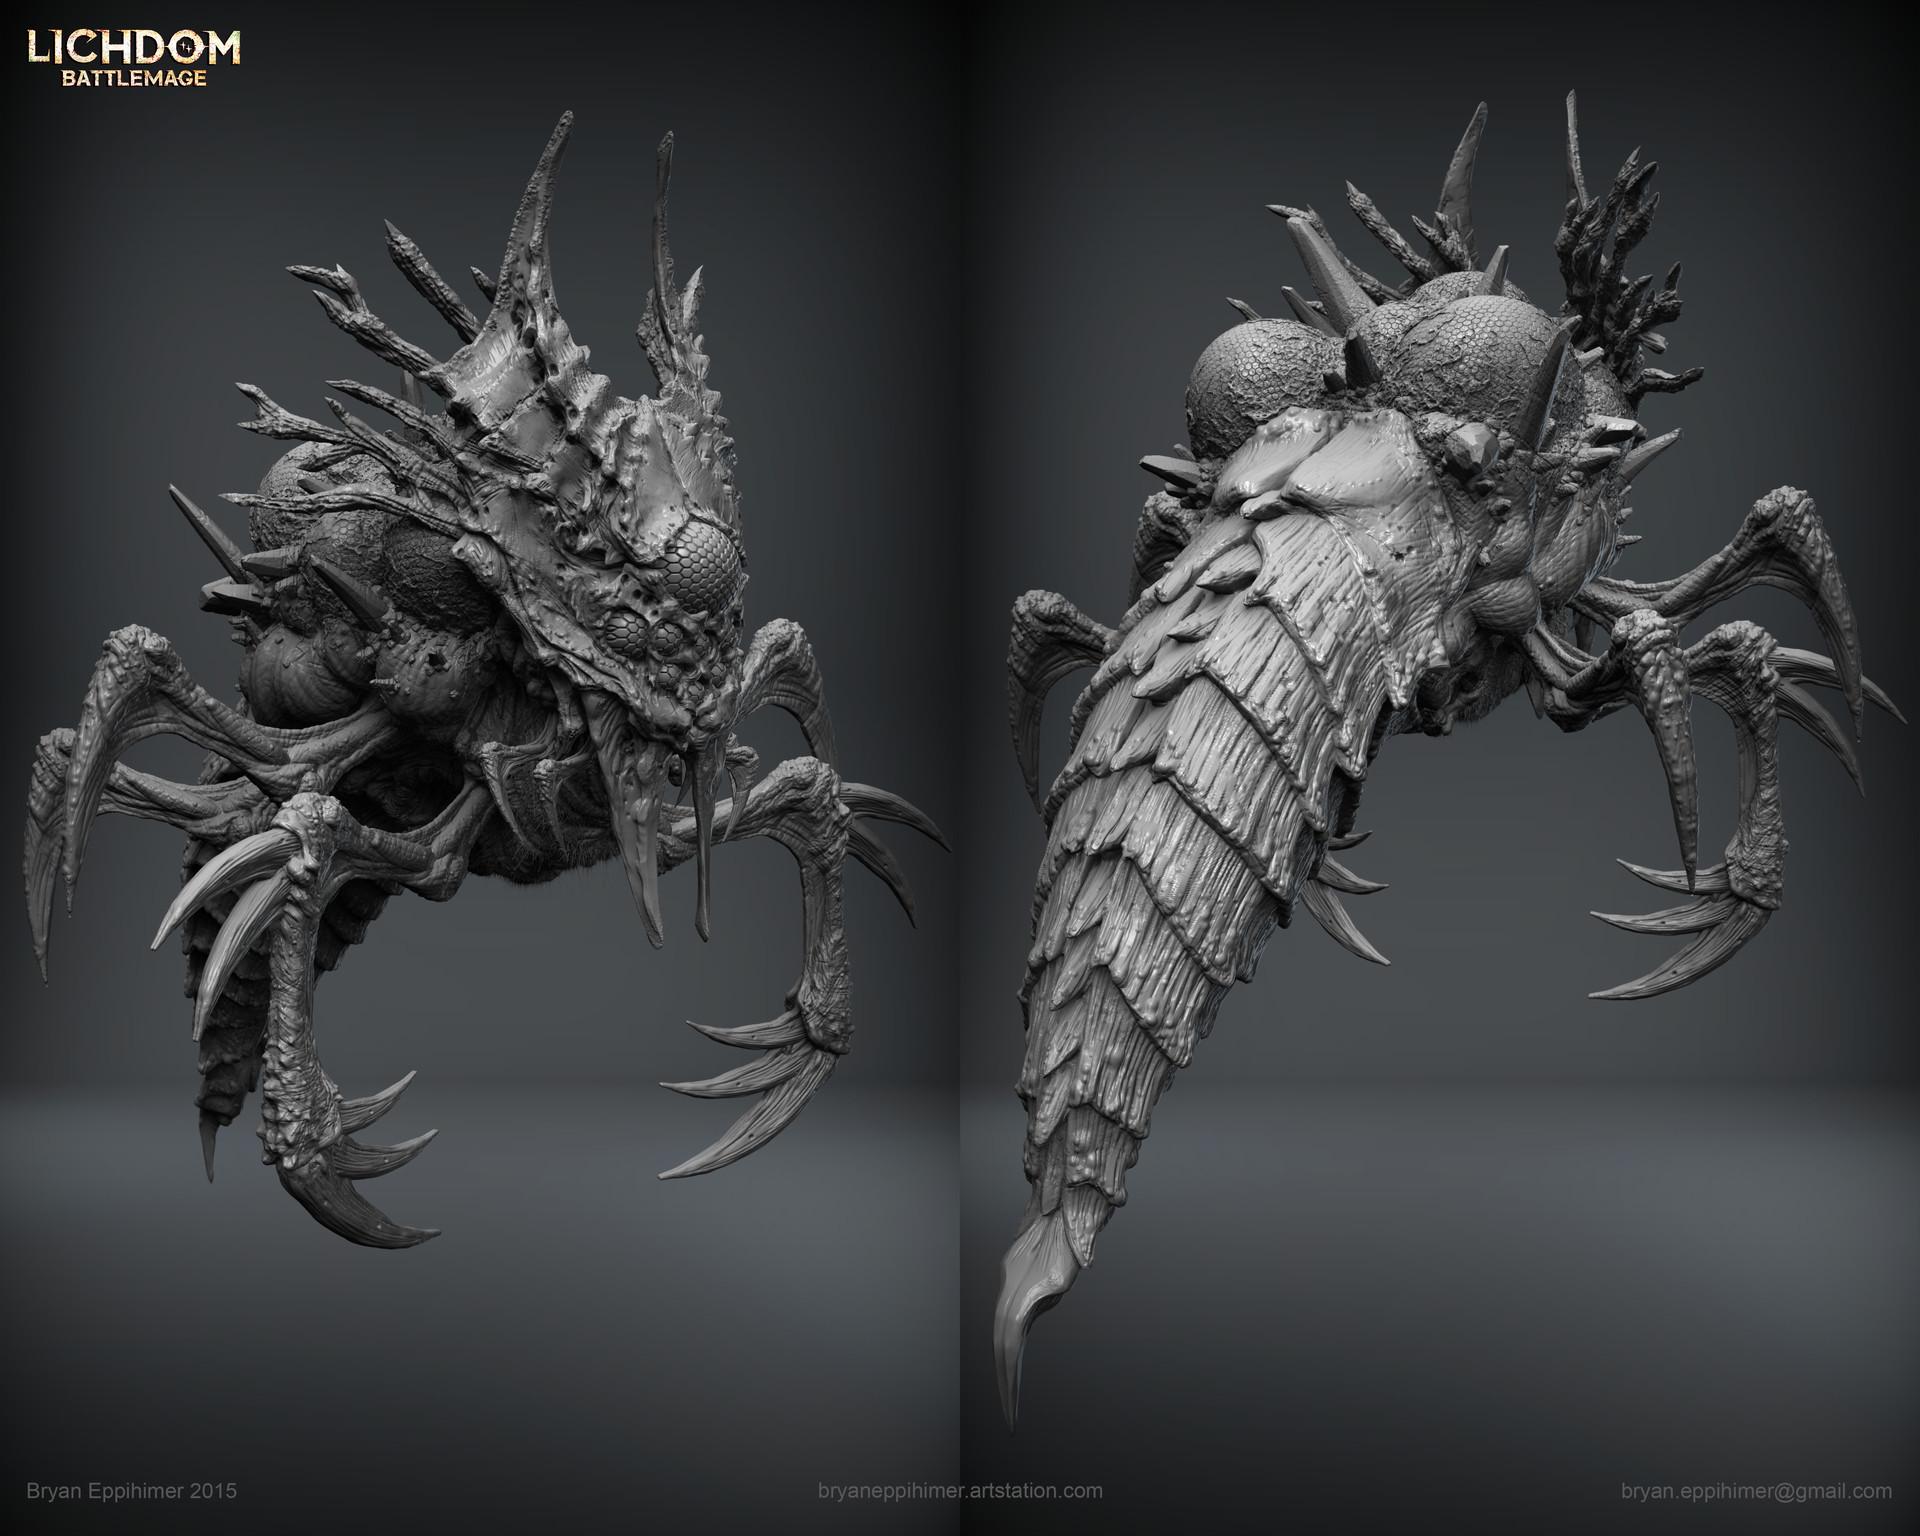 Bryan eppihimer bryaneppihimer xaviant demon insect 2015